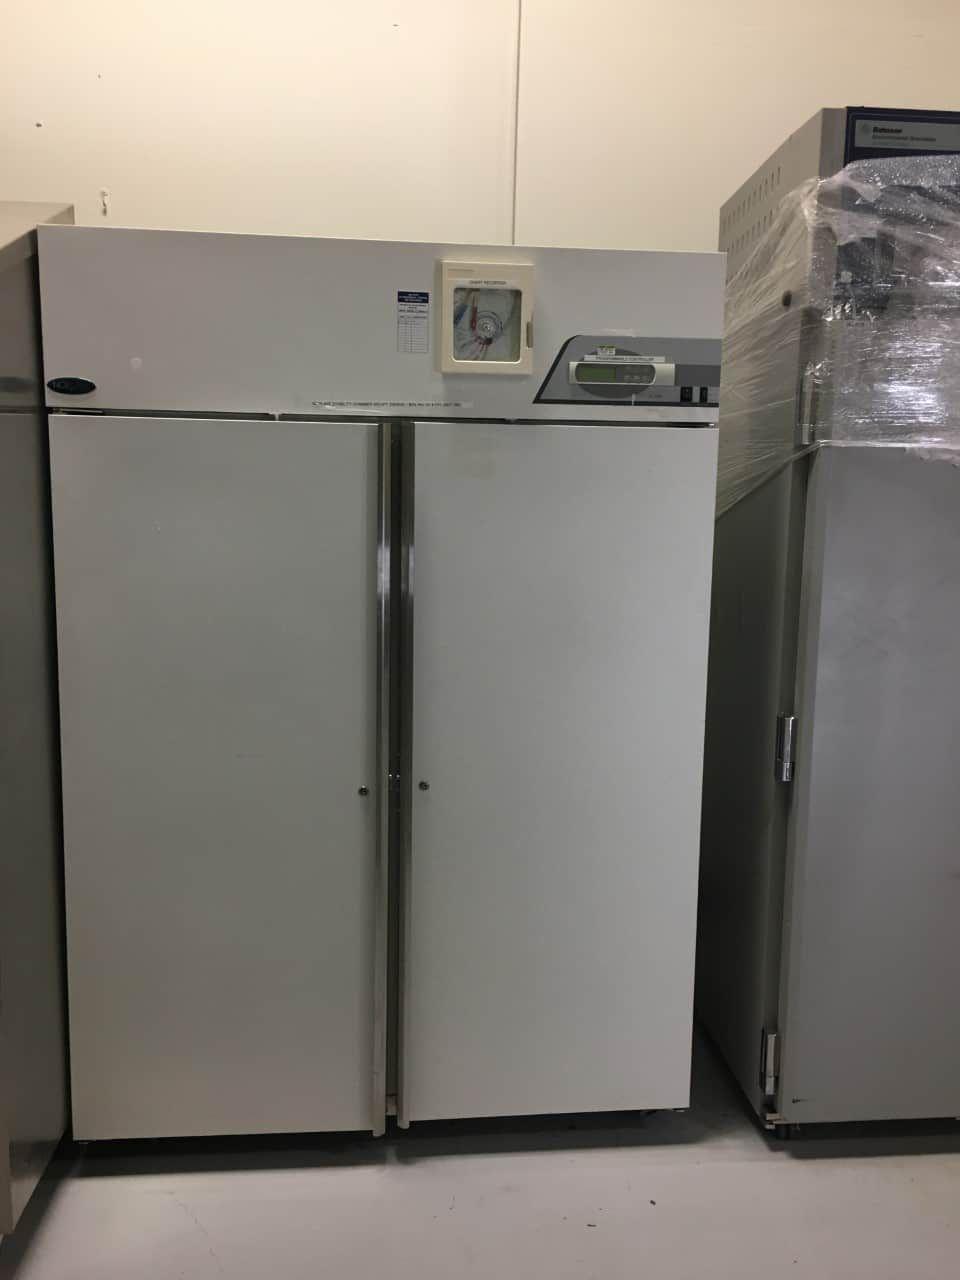 Norlake stability chamber - Double door